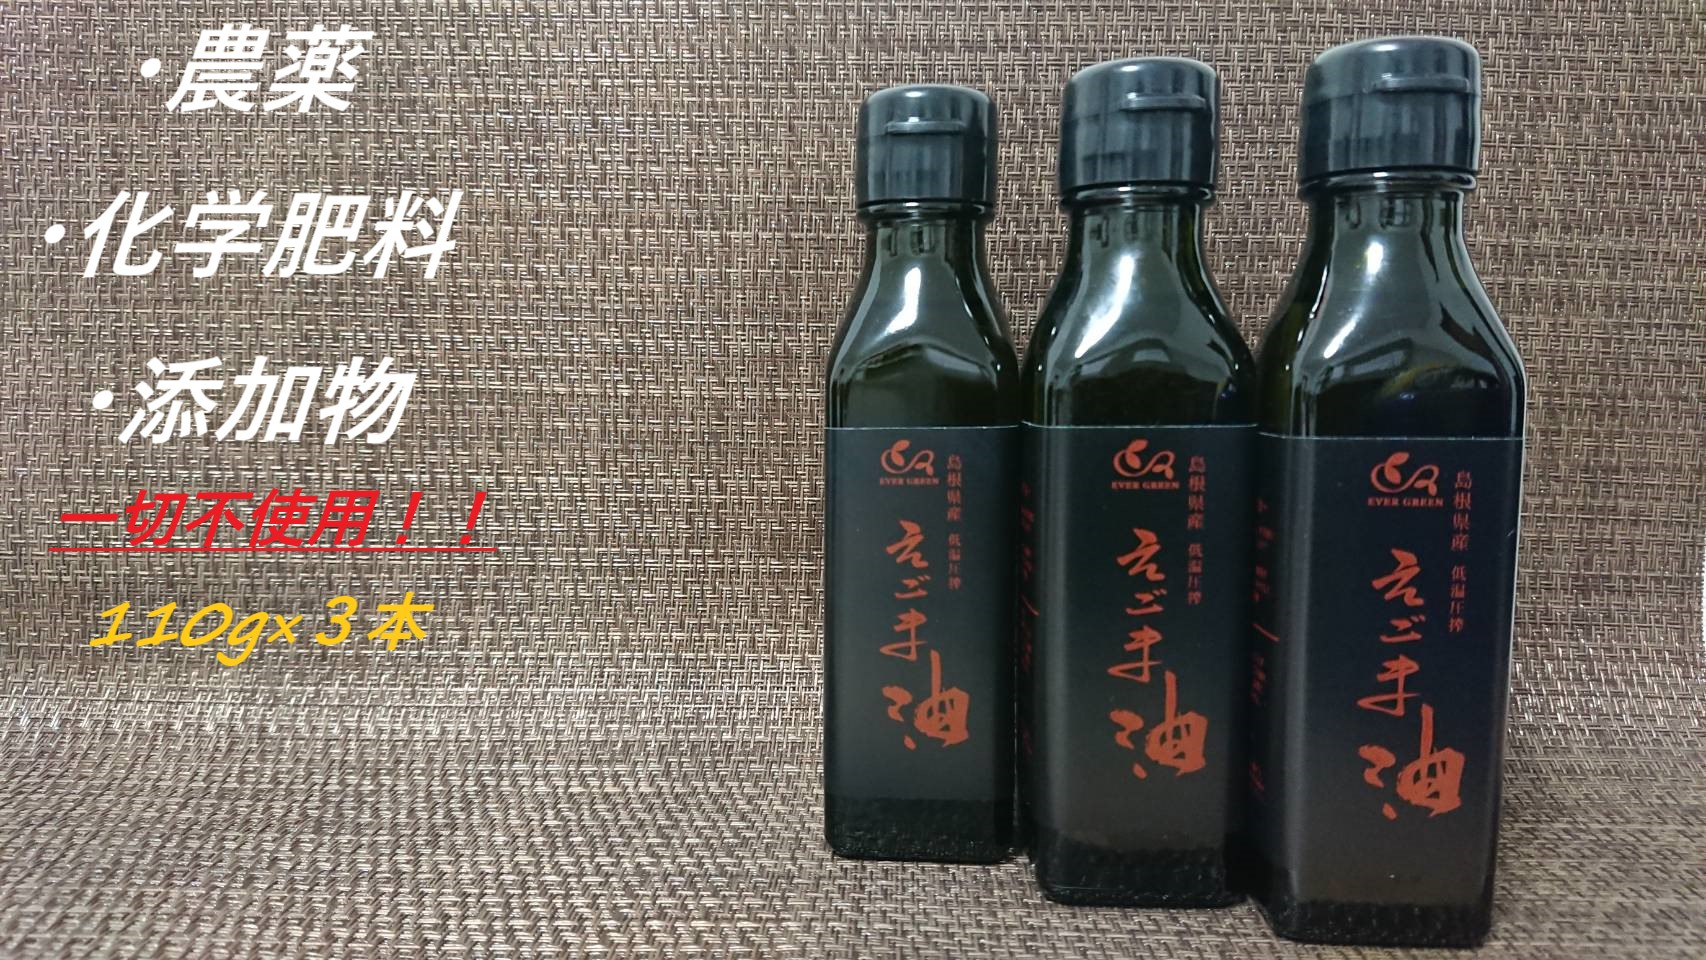 【えごま油】浜田市産 3本 ☆農薬・化学肥料・添加物等一切不使用